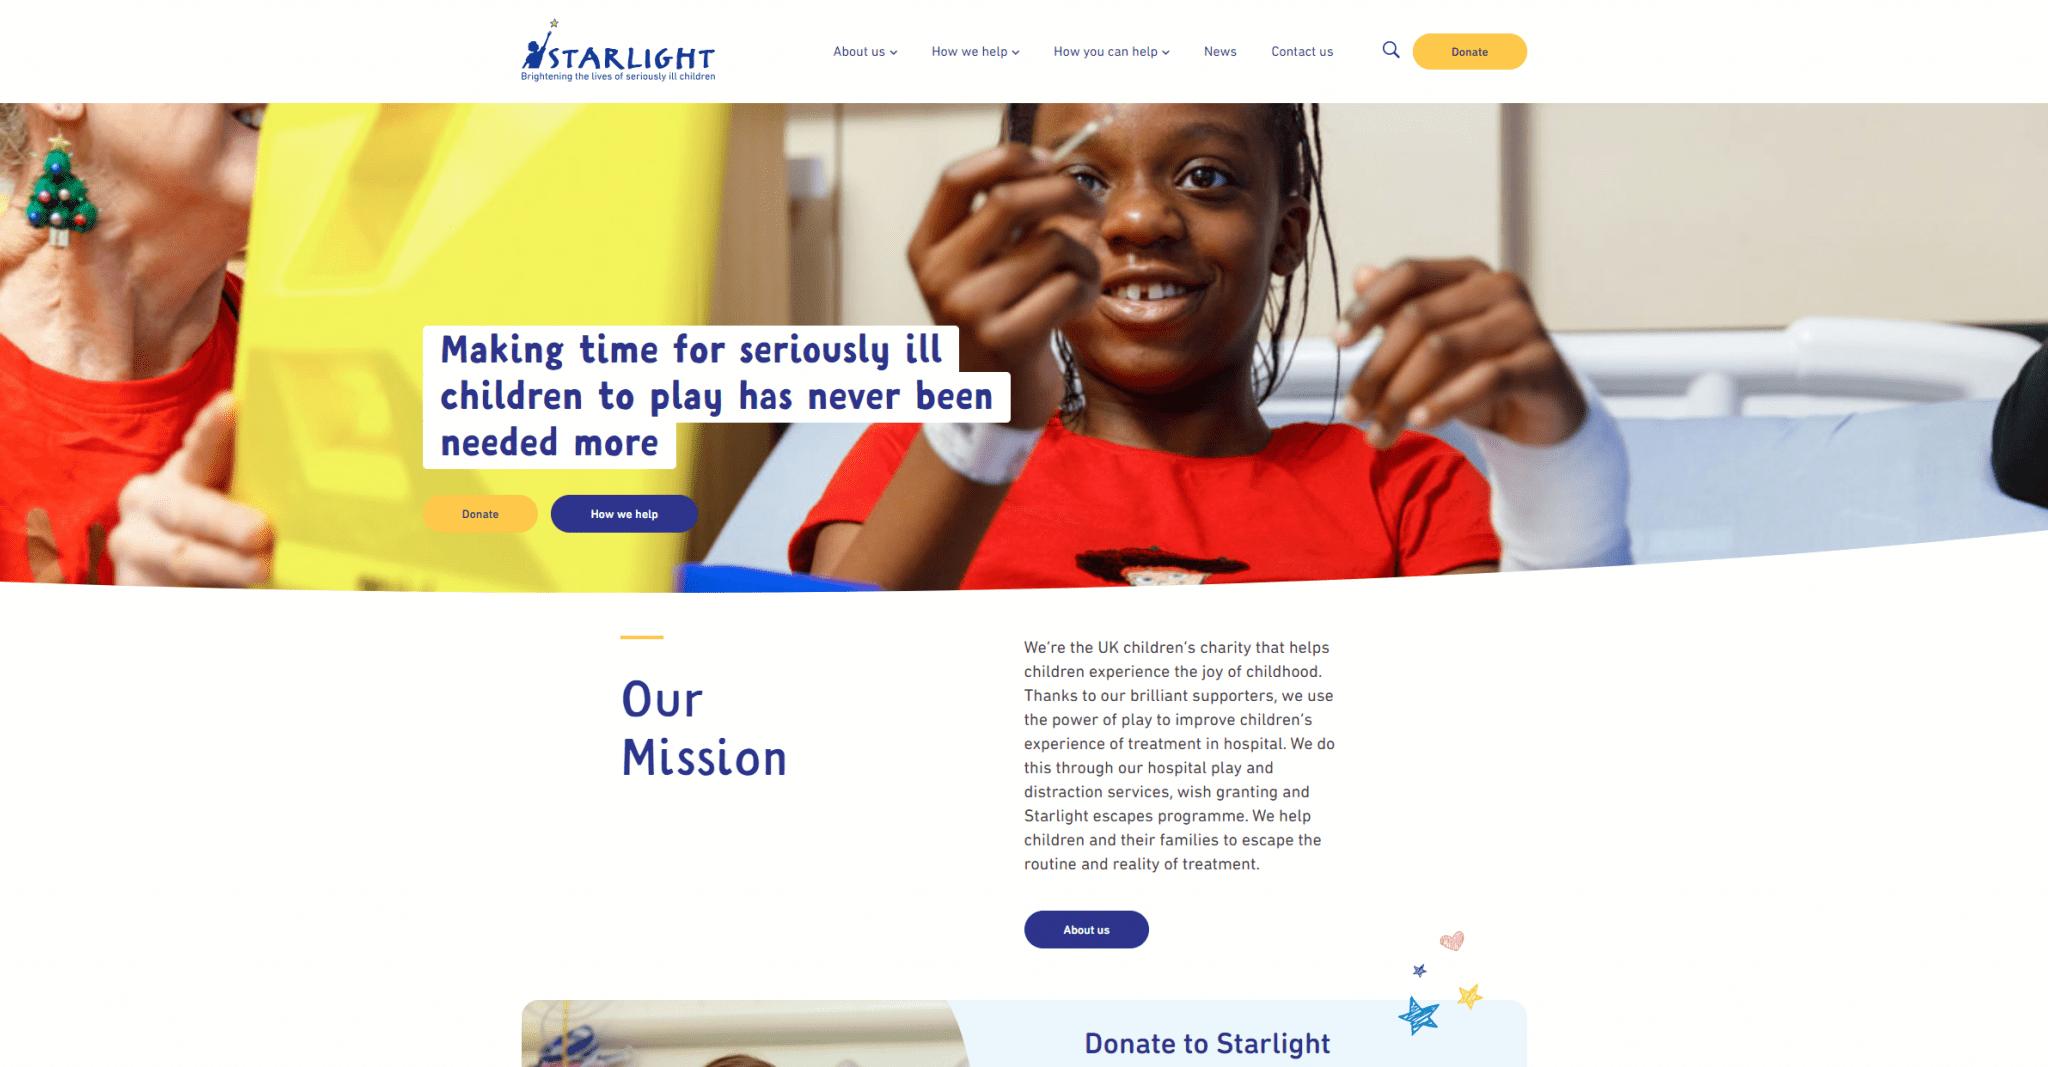 www.starlight.org.uk